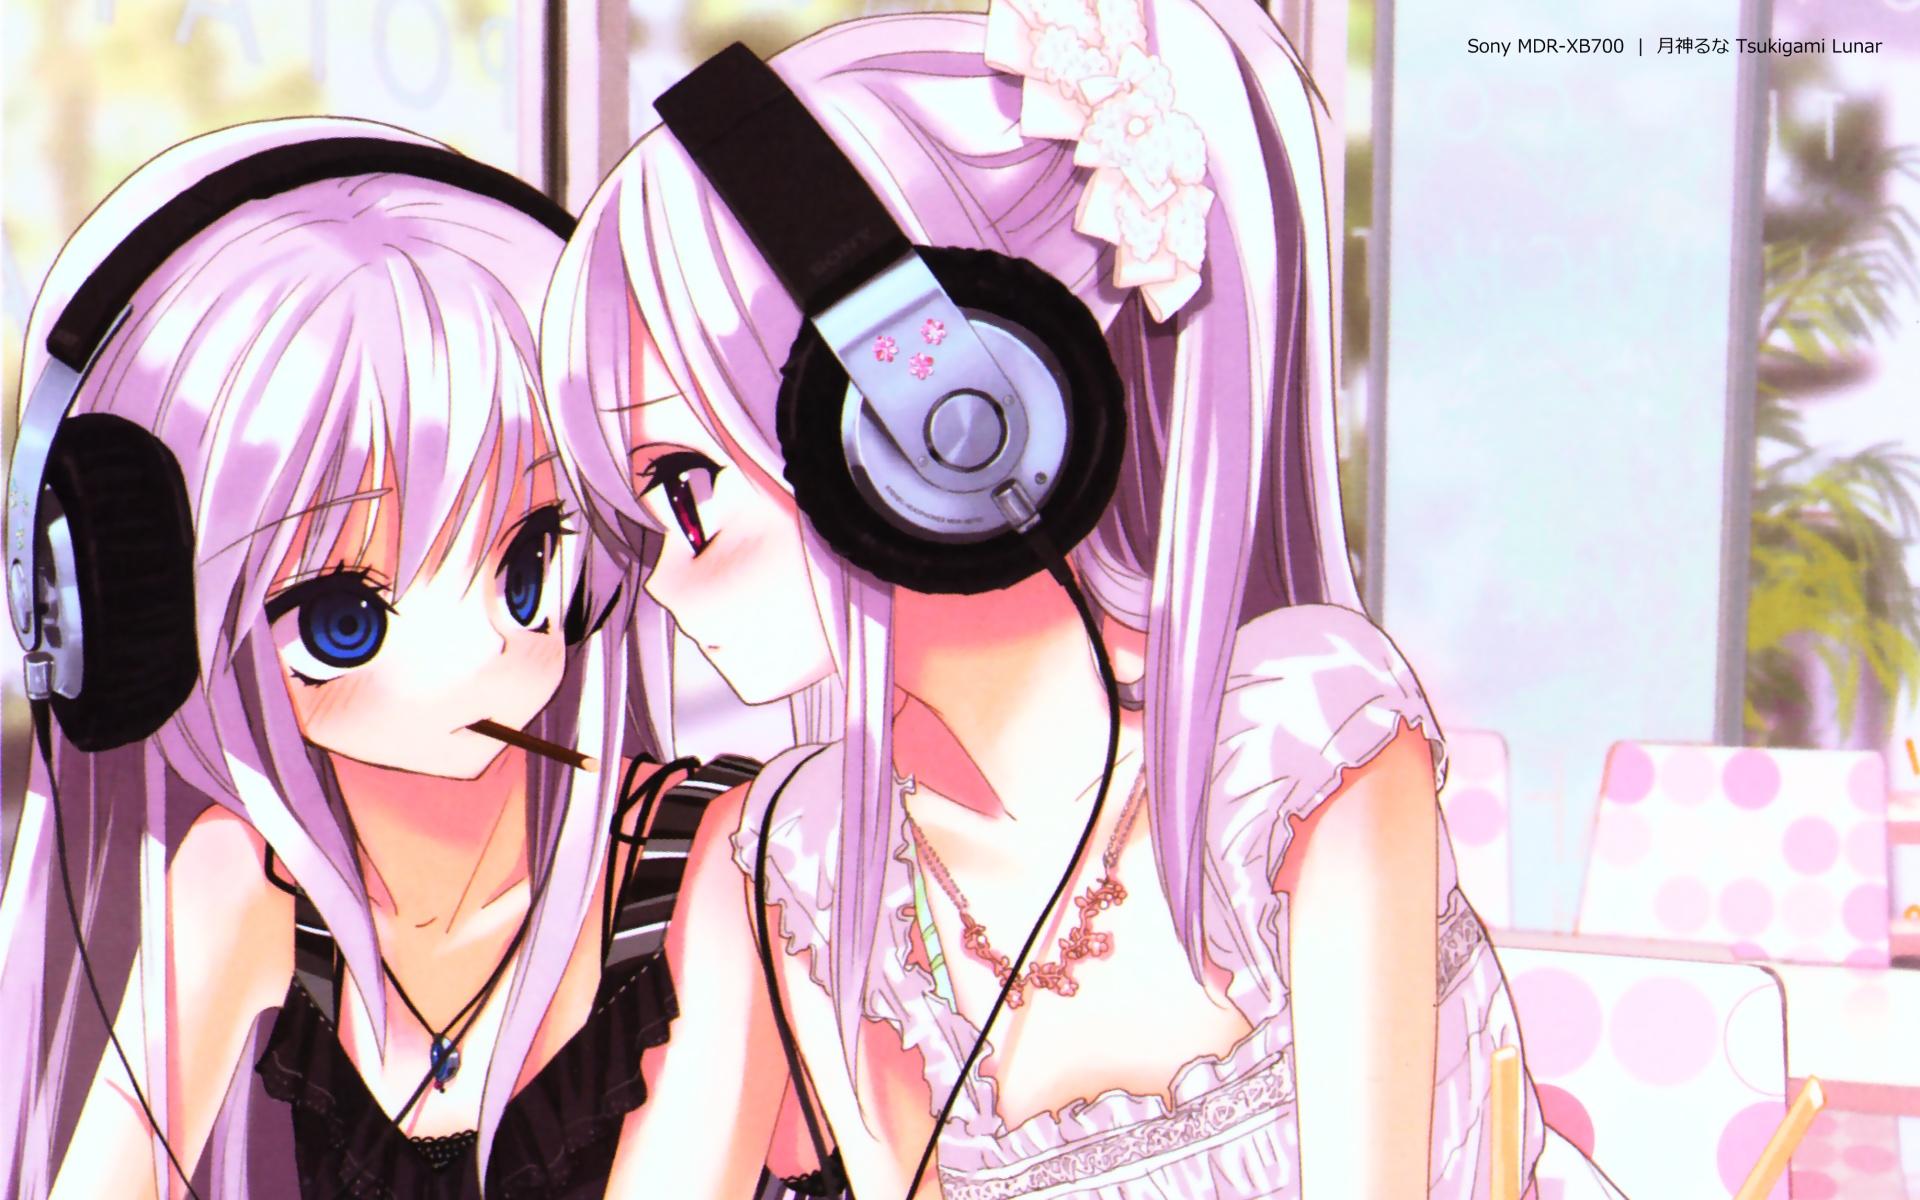 Anime - Headphones  Anime Wallpaper